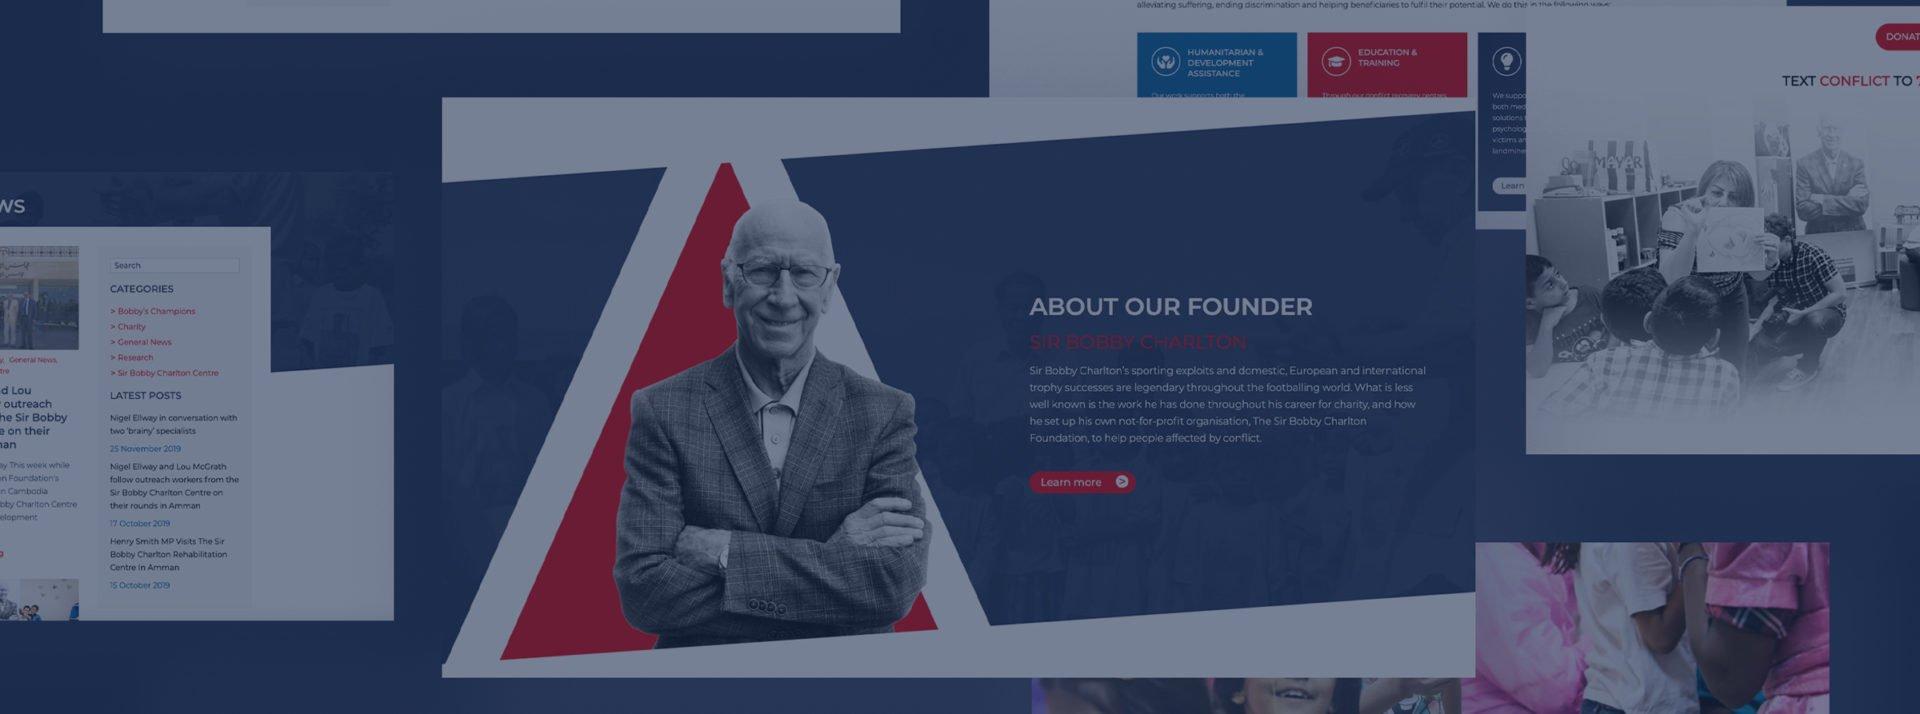 Sir Bobby Charlton Foundation Branding